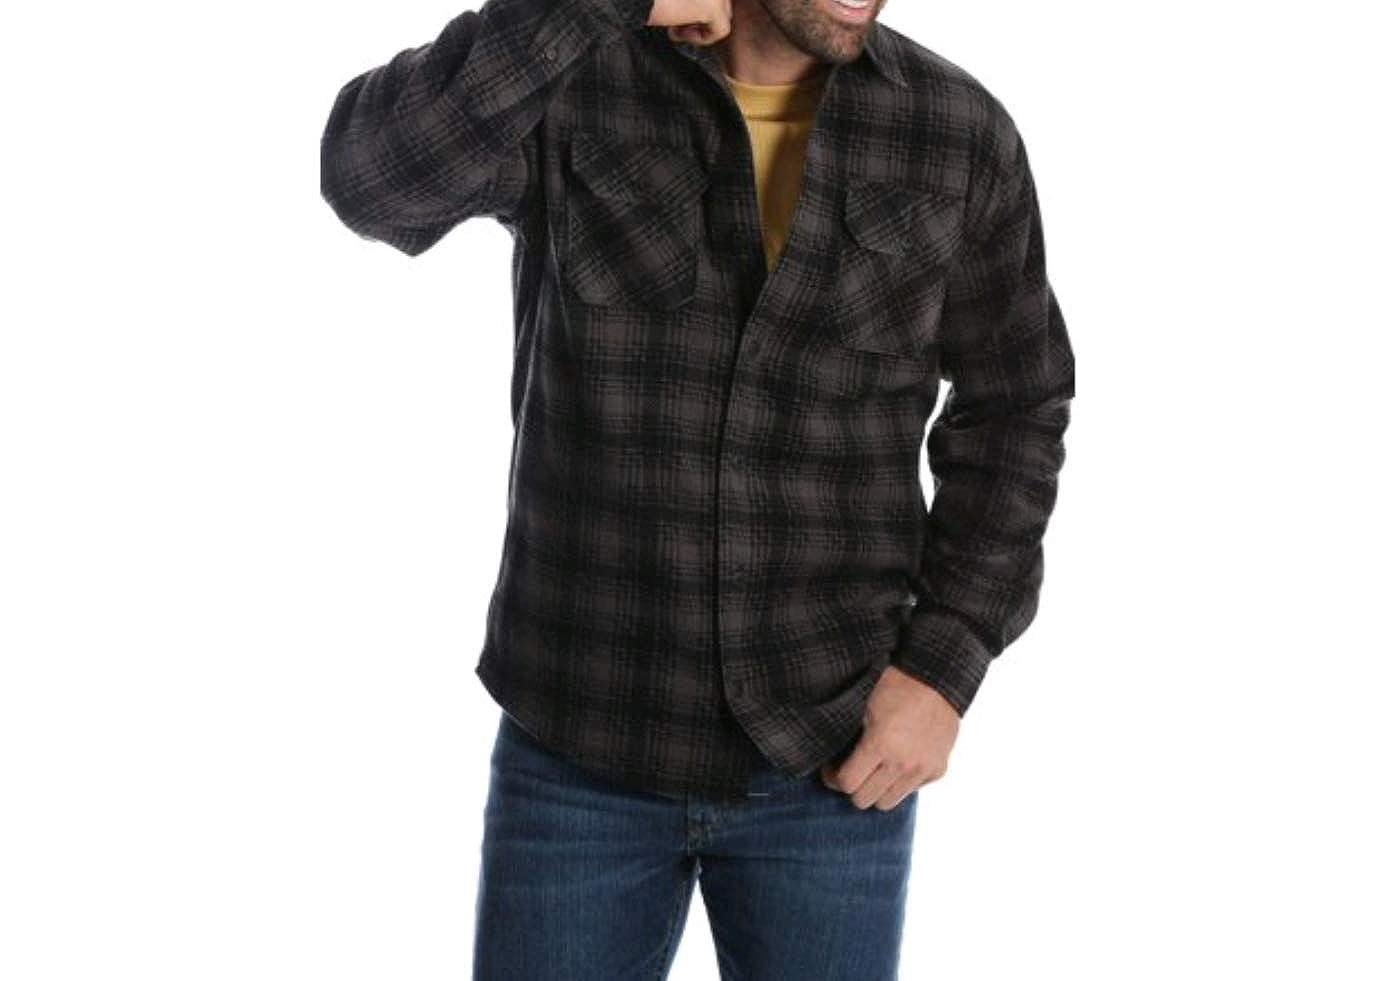 Medium 38//40, Caviar Wrangler Mens Long Sleeve Fleece Flannel Shirt